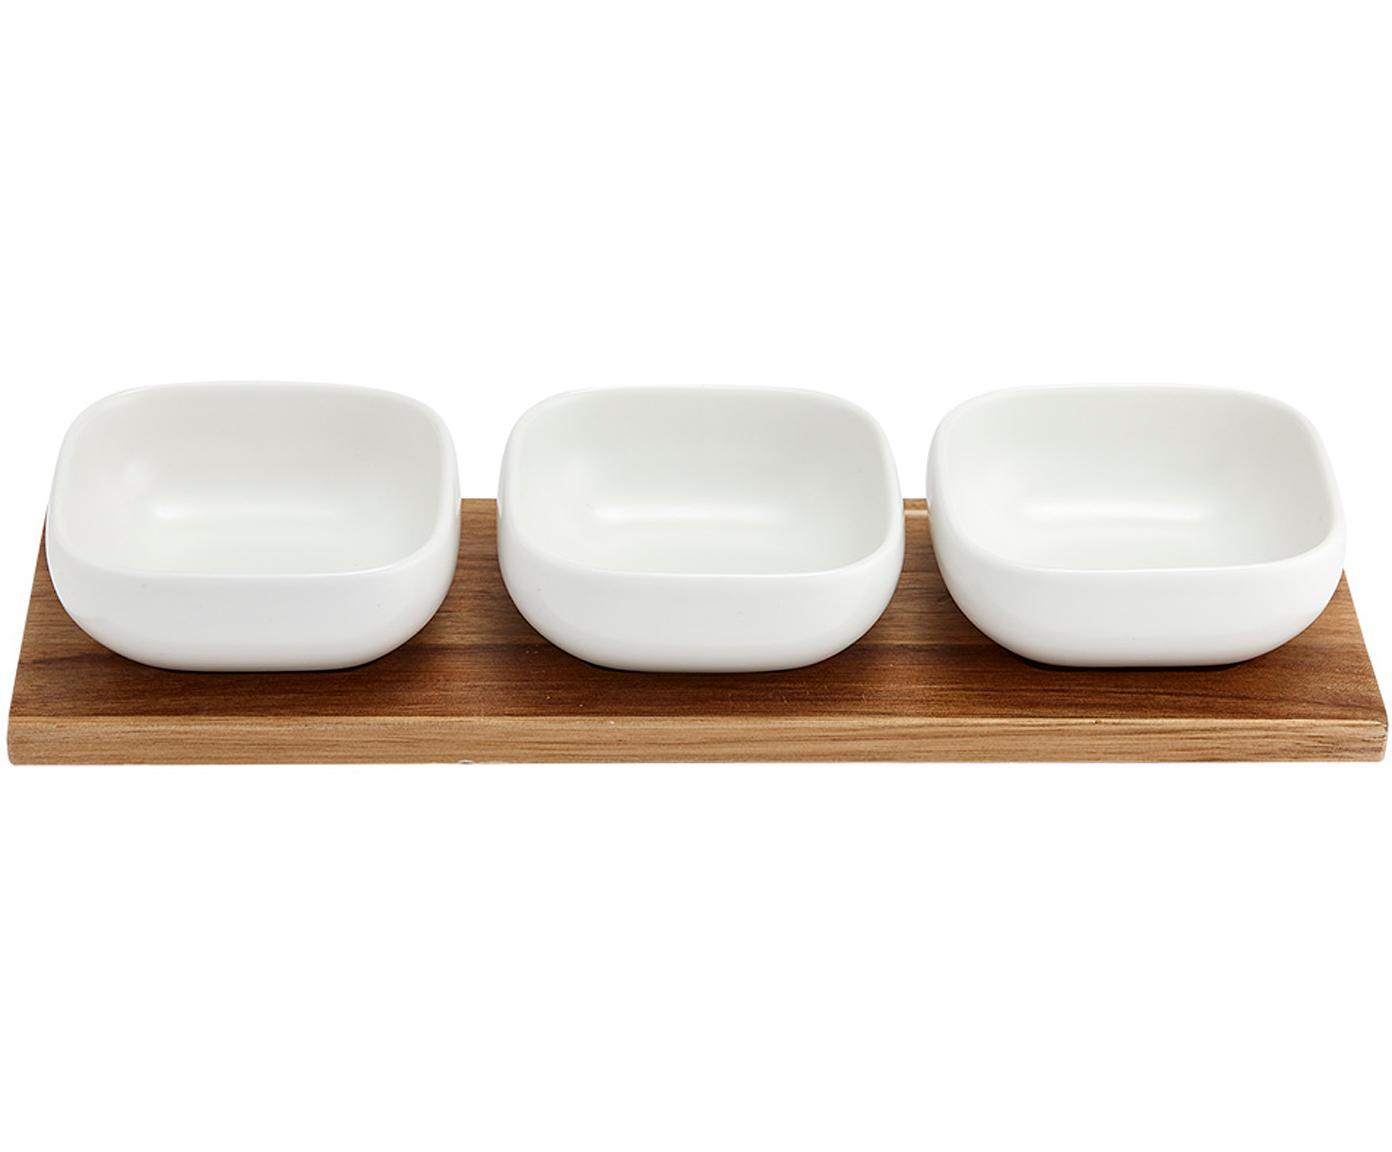 Schalenset Essentials van porselein en acaciahout, 4-delig, Porselein, acaciahout, Zandkleurig, acaciahoutkleurig, 33 x 5 cm